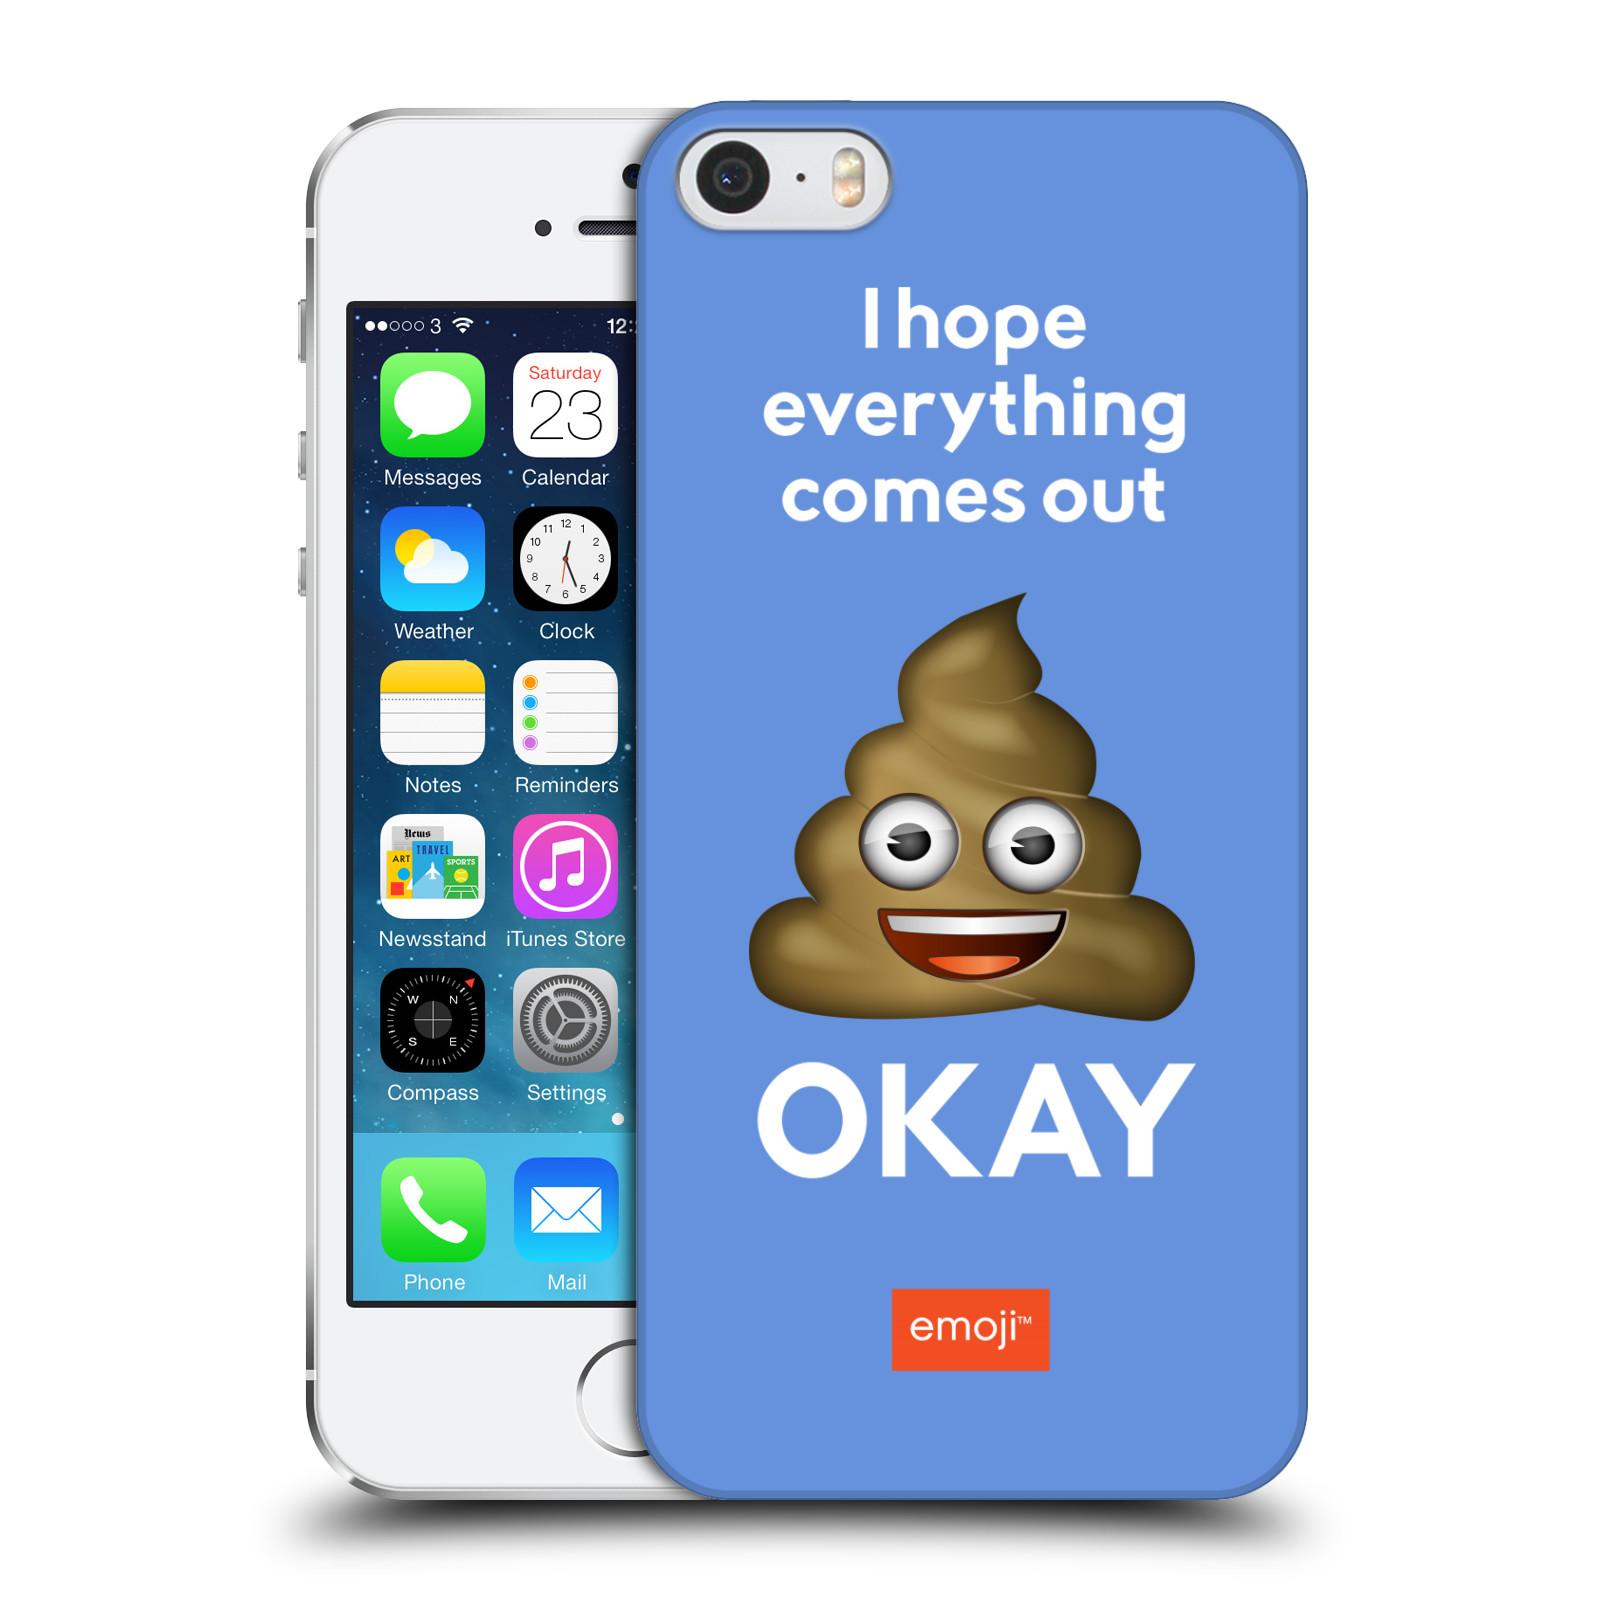 Plastové pouzdro na mobil Apple iPhone 5 a 5S HEAD CASE EMOJI - Hovínko OKAY